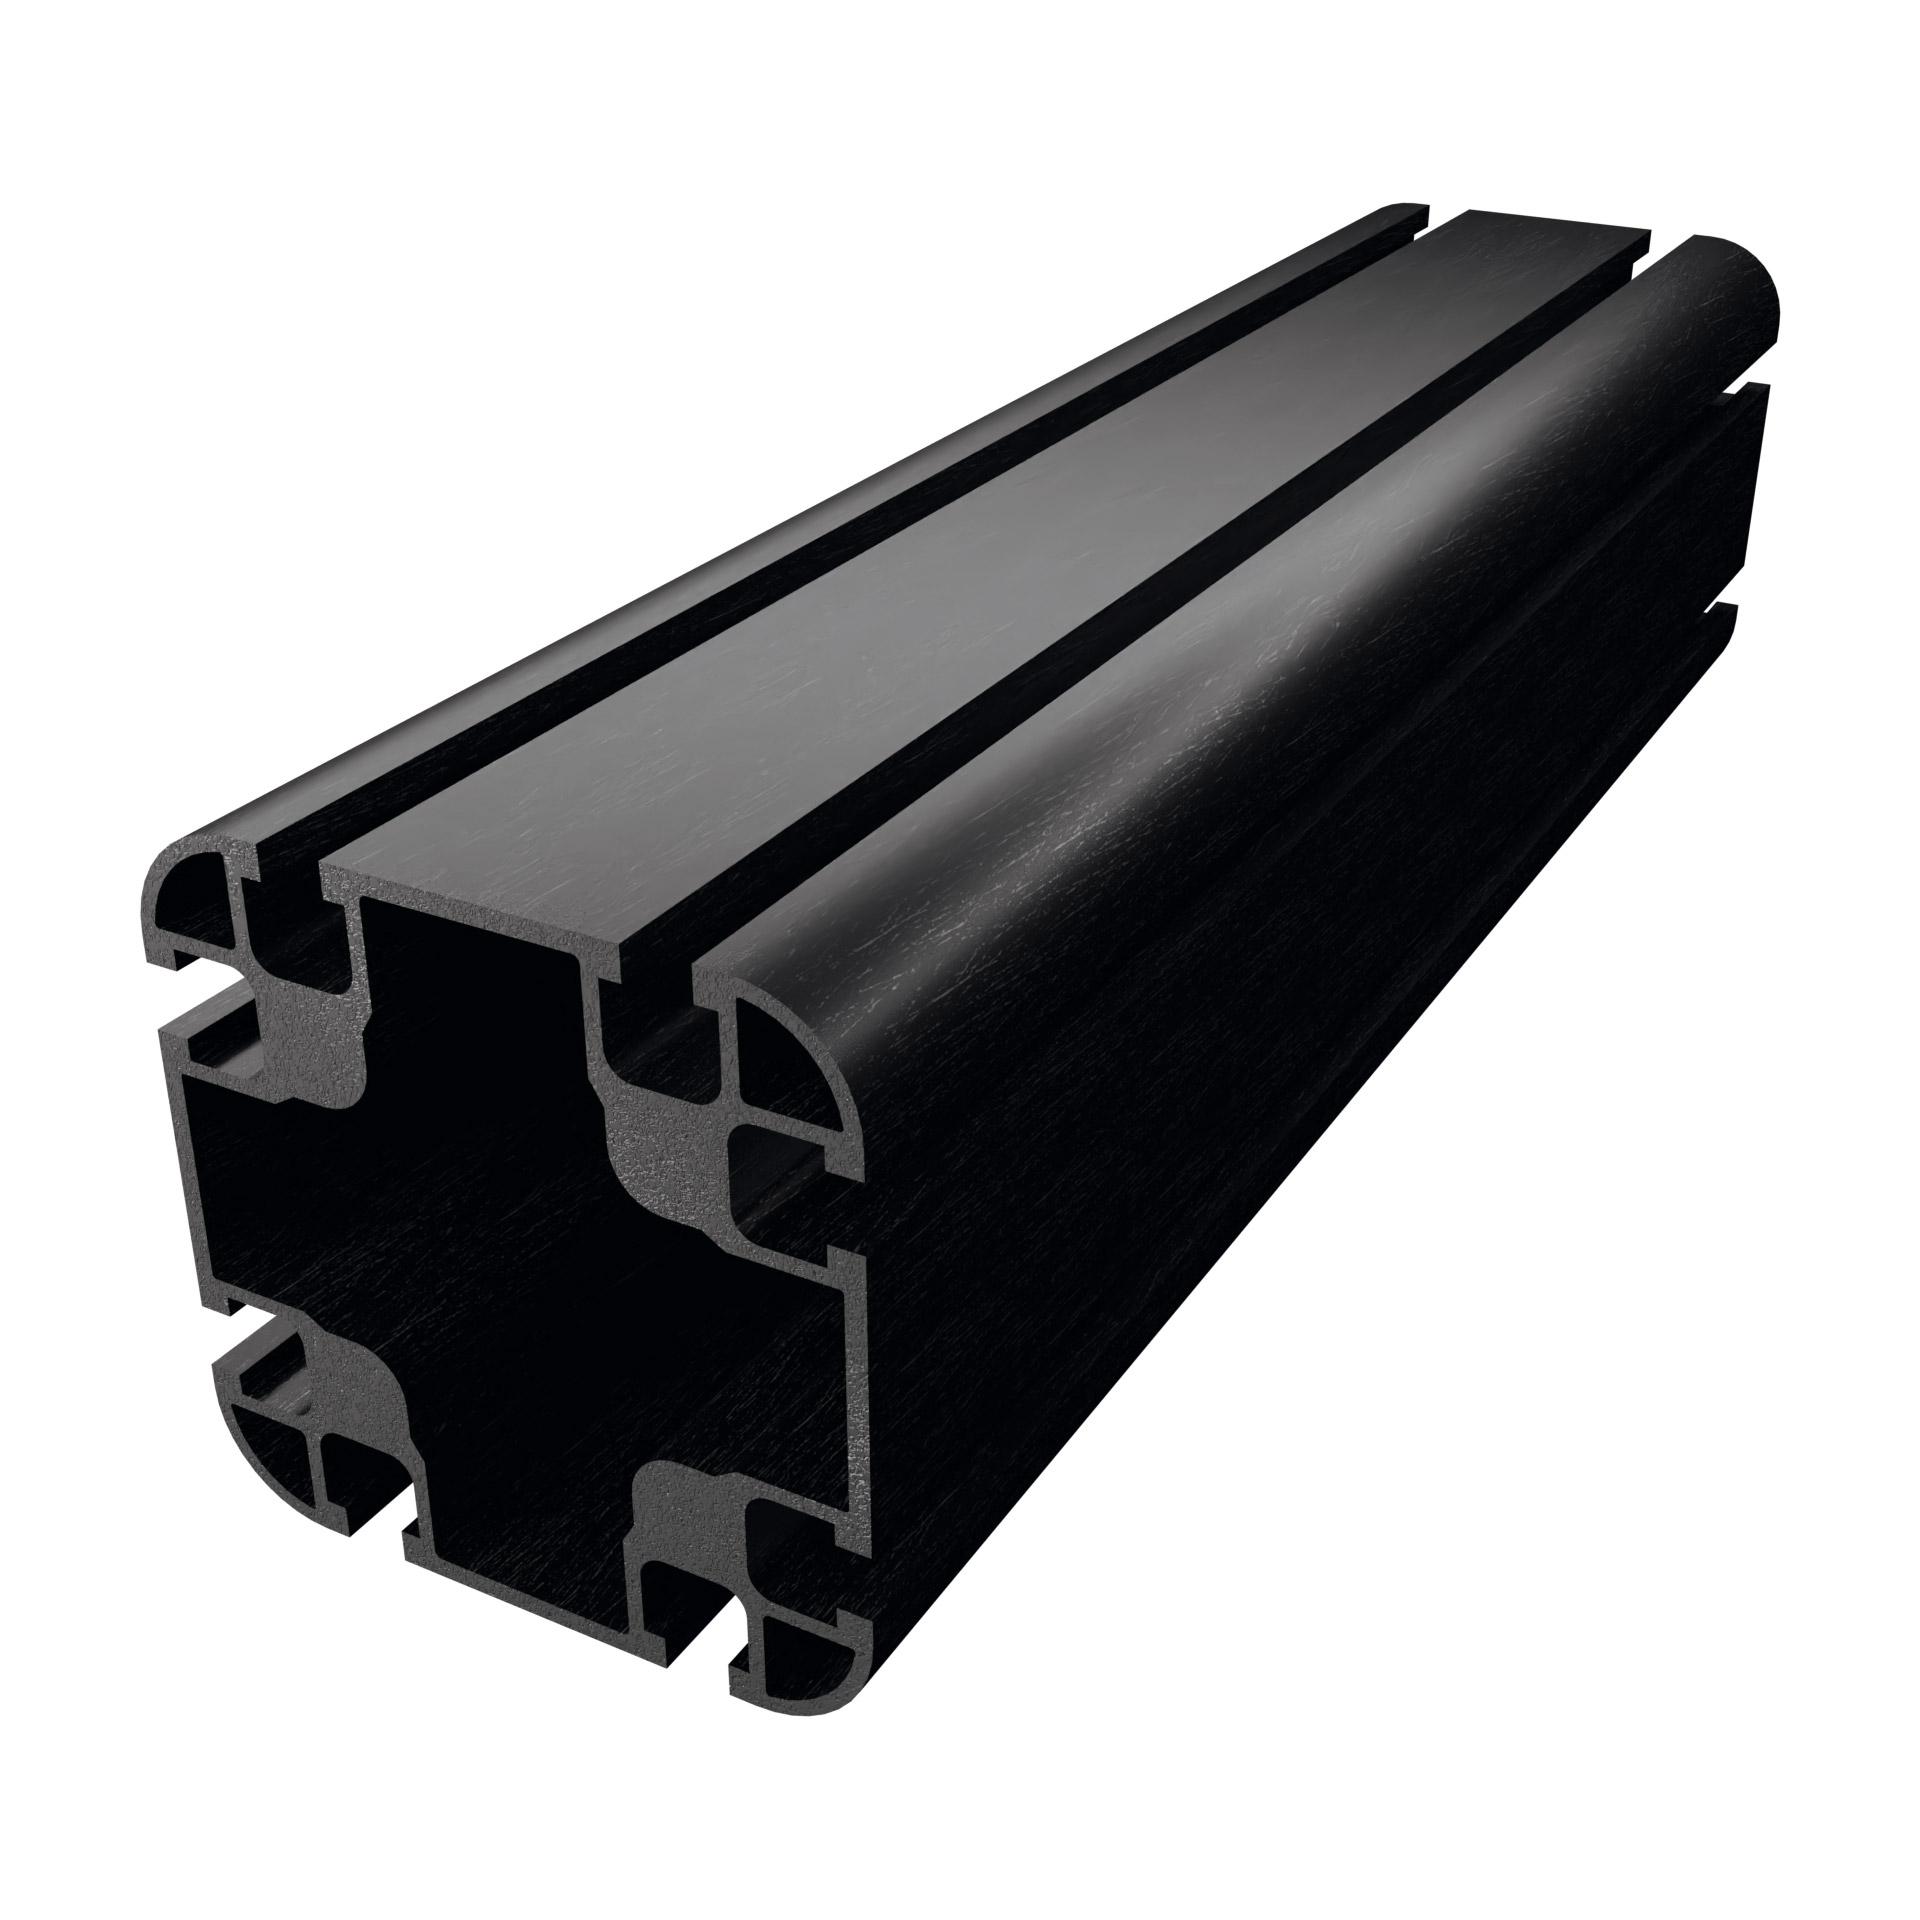 CarboSix carbon fibre profile 90x90